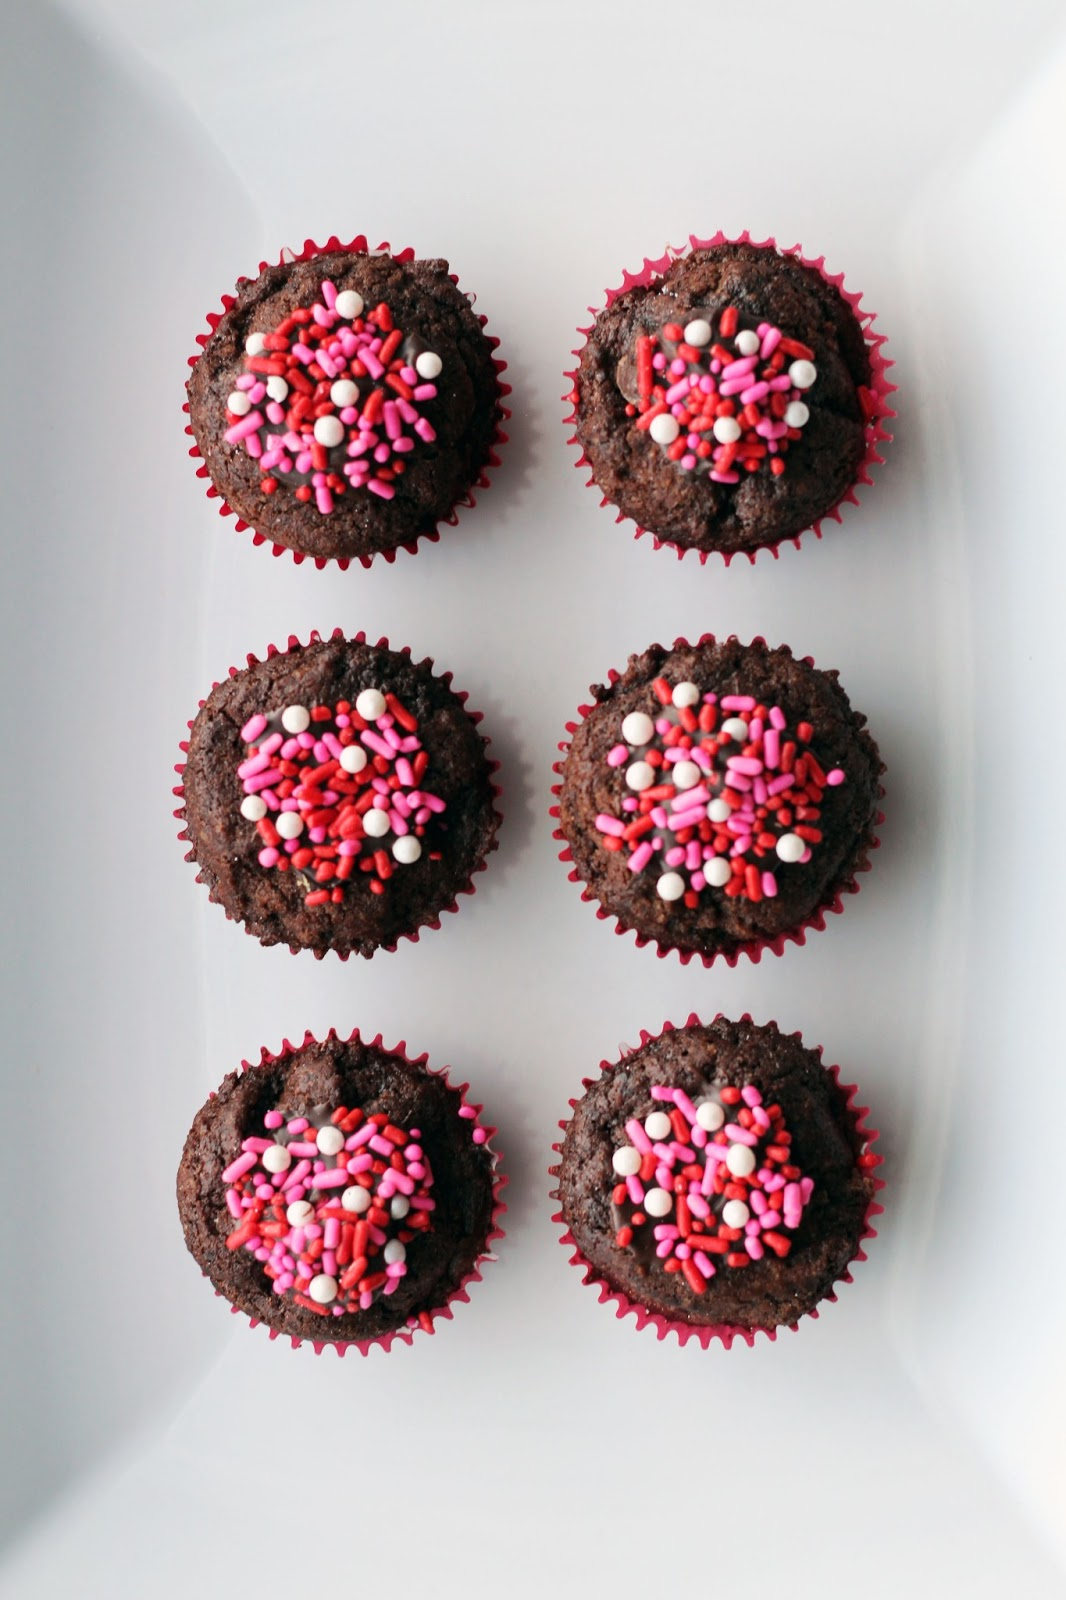 Brownie Hearts And Brownie Bites Recipe — Dishmaps